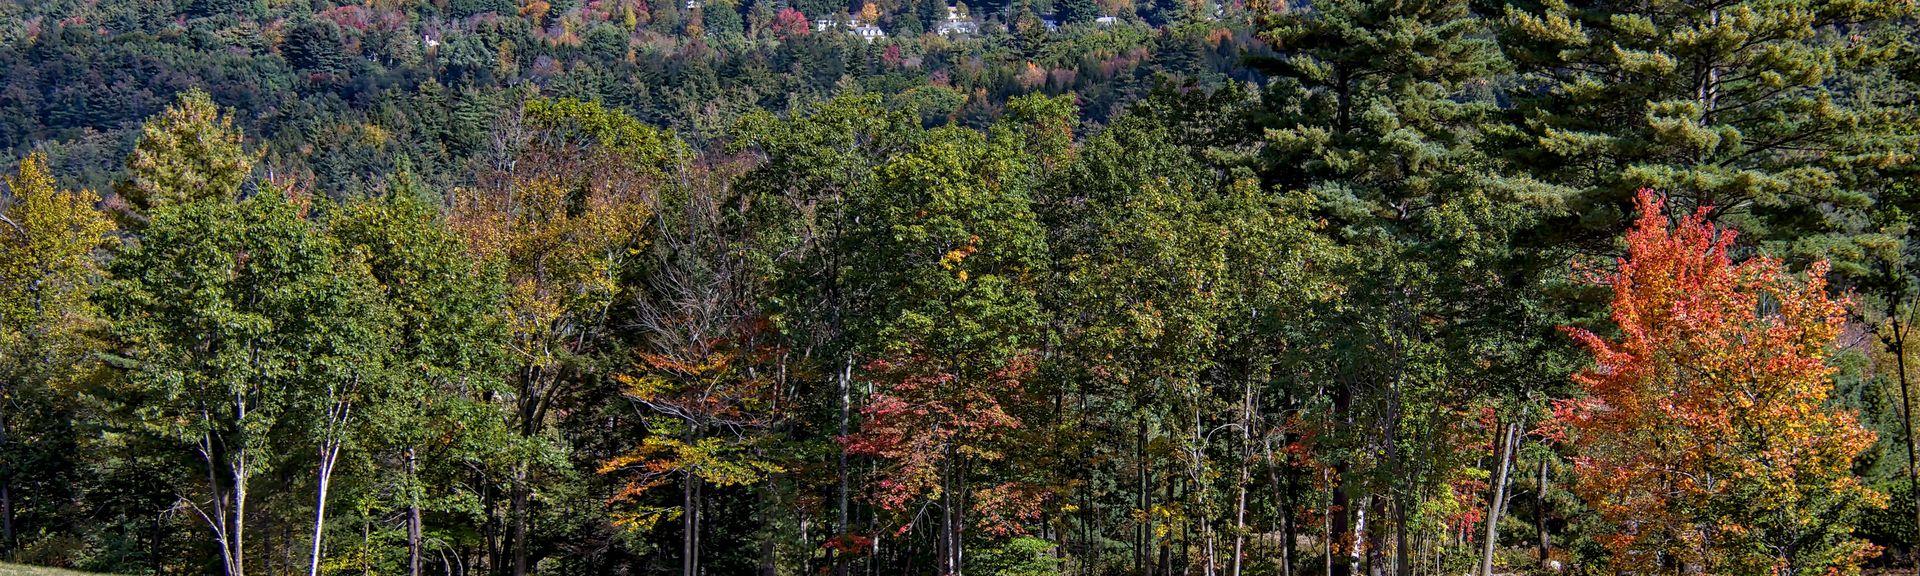 Hillsborough County, NH, USA